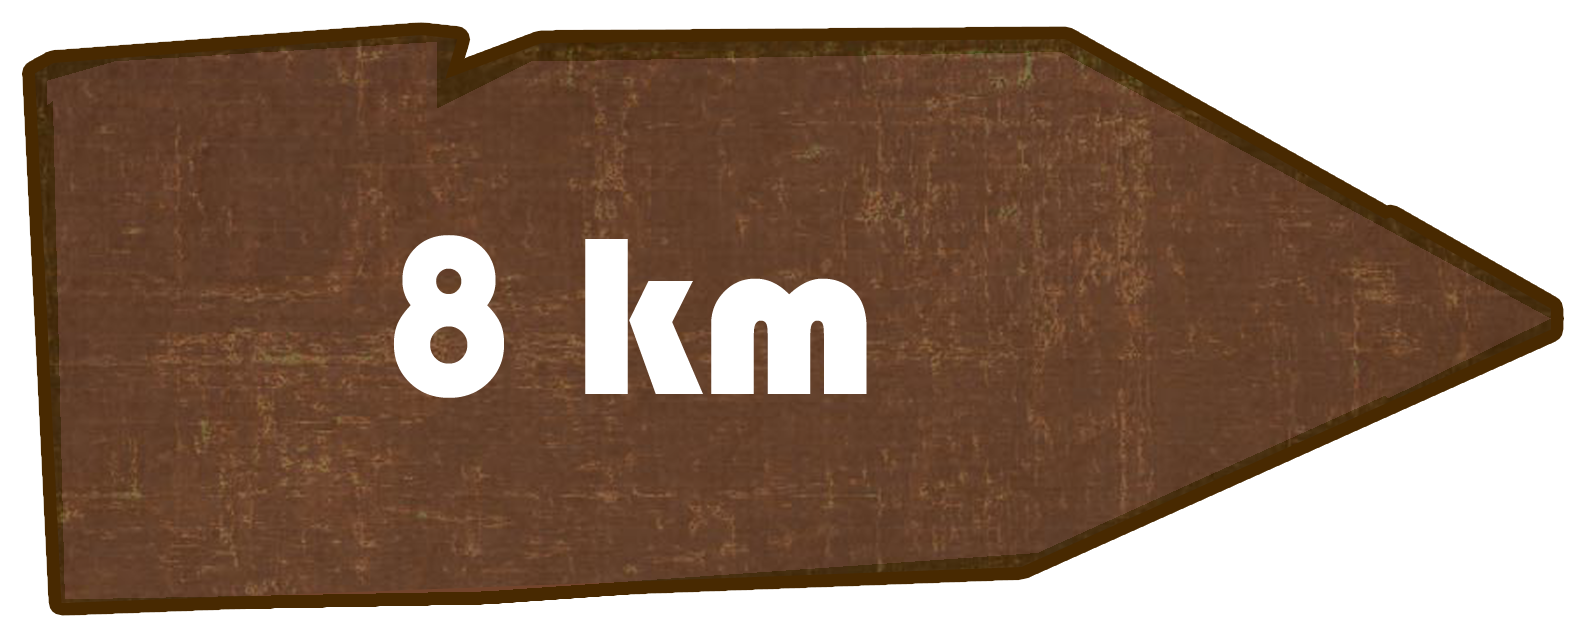 Kilometer Große Drohmbergrunde mit Cosuler Tal